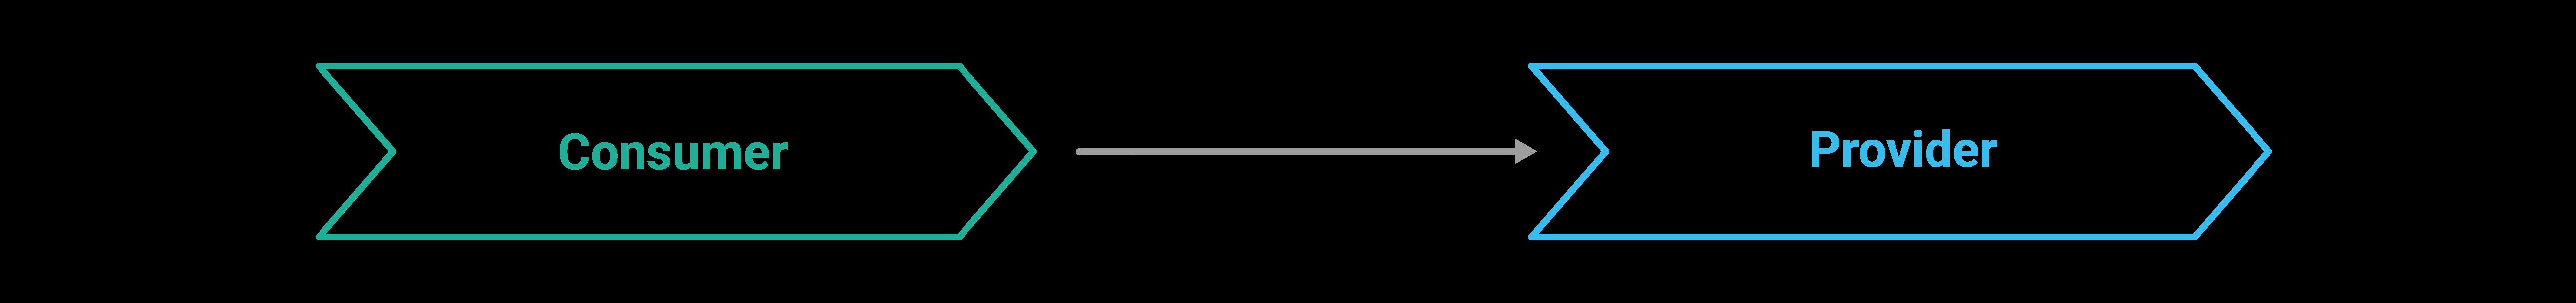 Bild zeigt klassisches Integration Testing